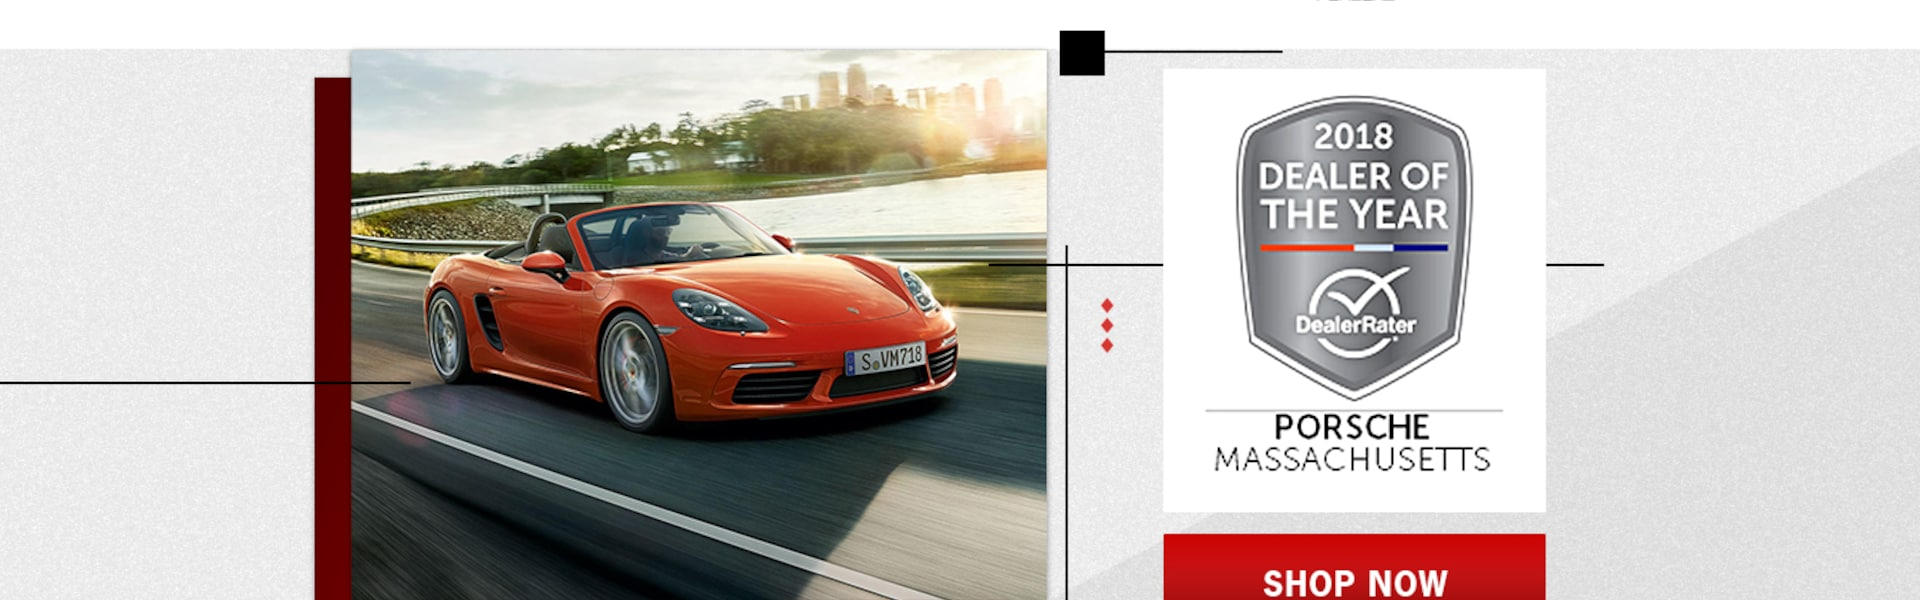 Herb Chambers Porsche >> Herb Chambers Porsche Burlington Best Car Update 2019 2020 By